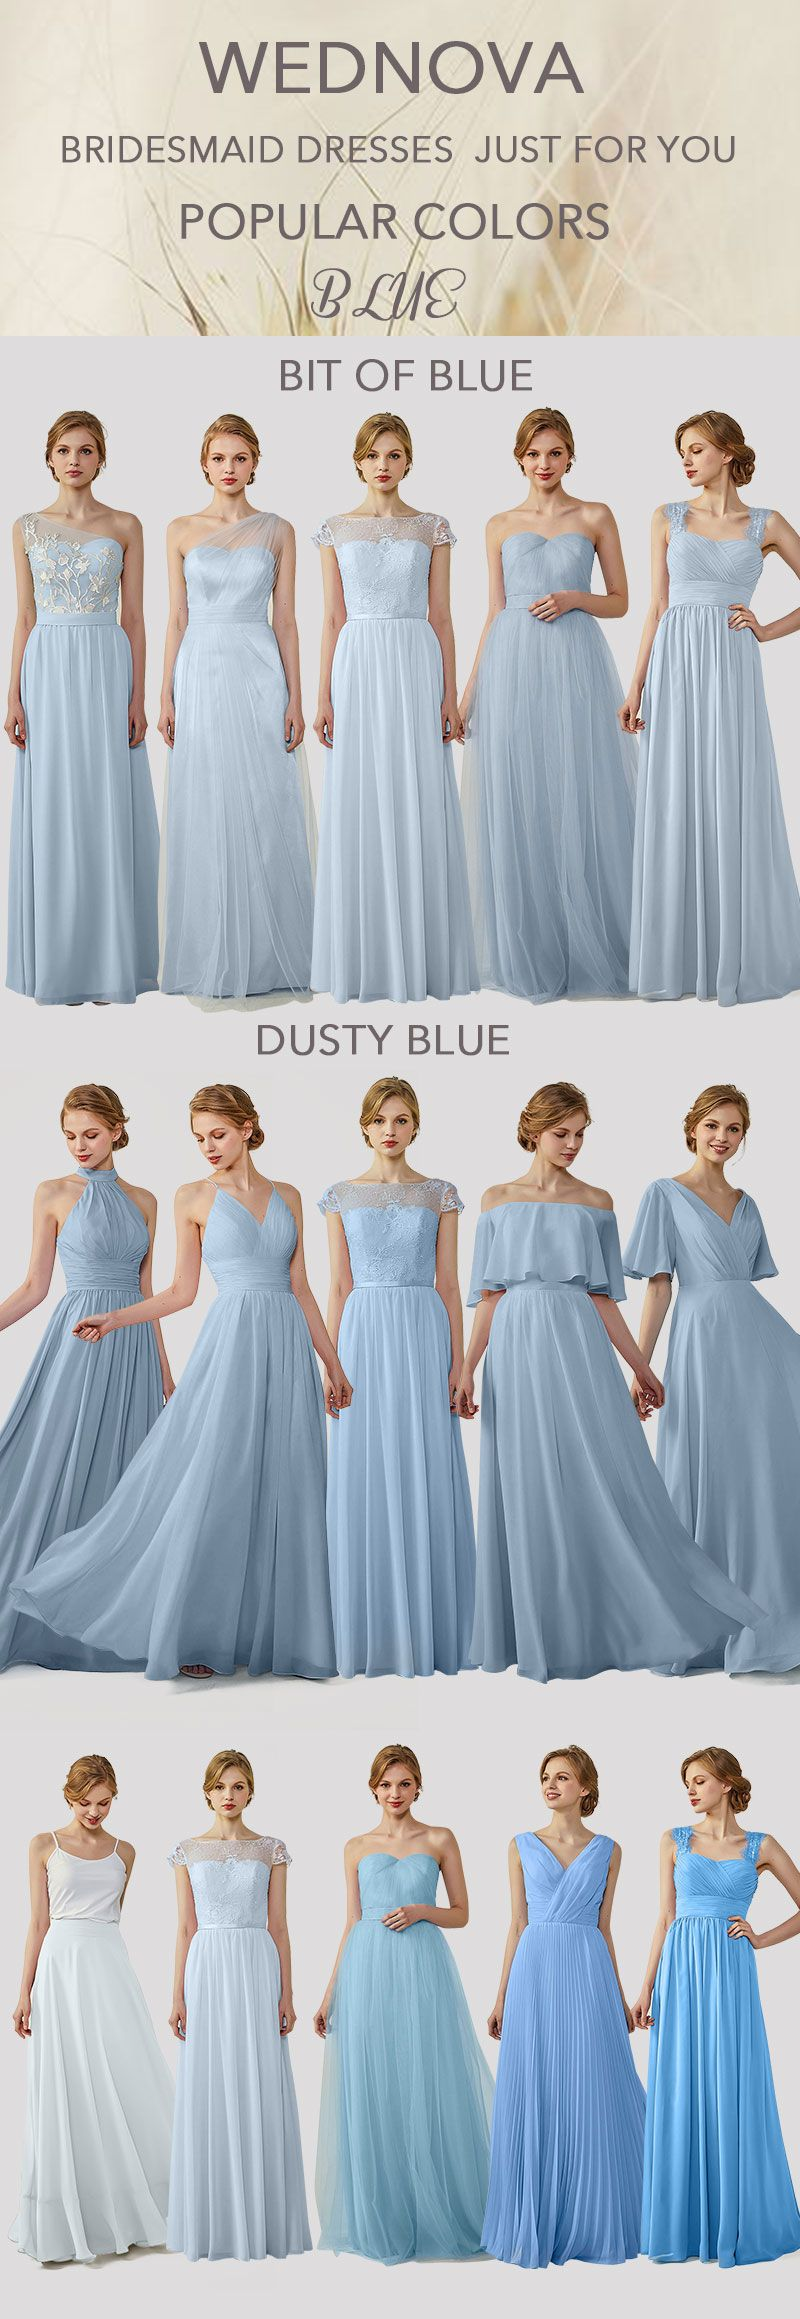 Blue chiffon bridesmaid dresses long with lace spaghetti straps